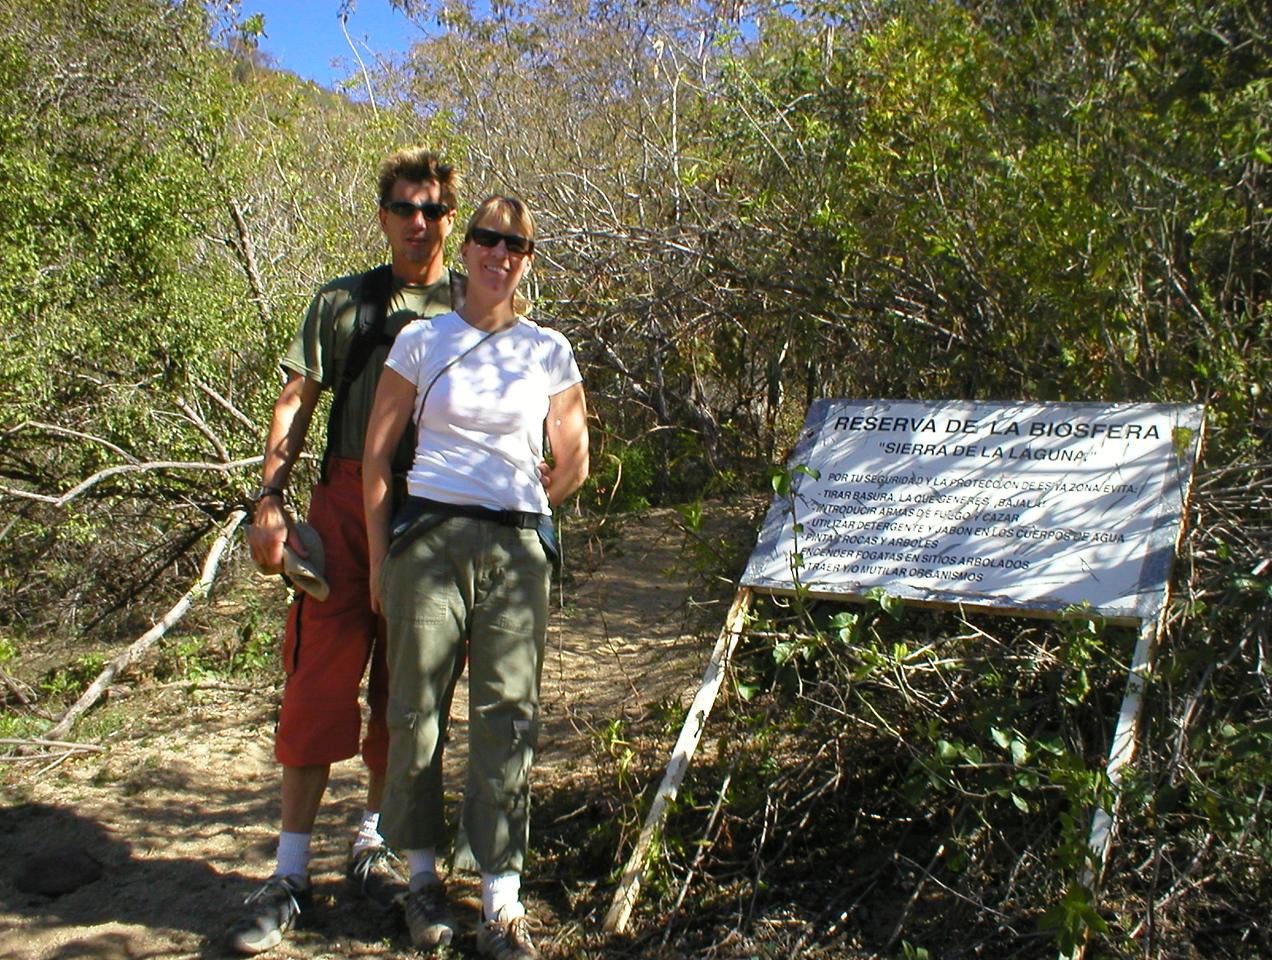 Reserva de la Biospeha. This hike takes you through seven Biospheres.